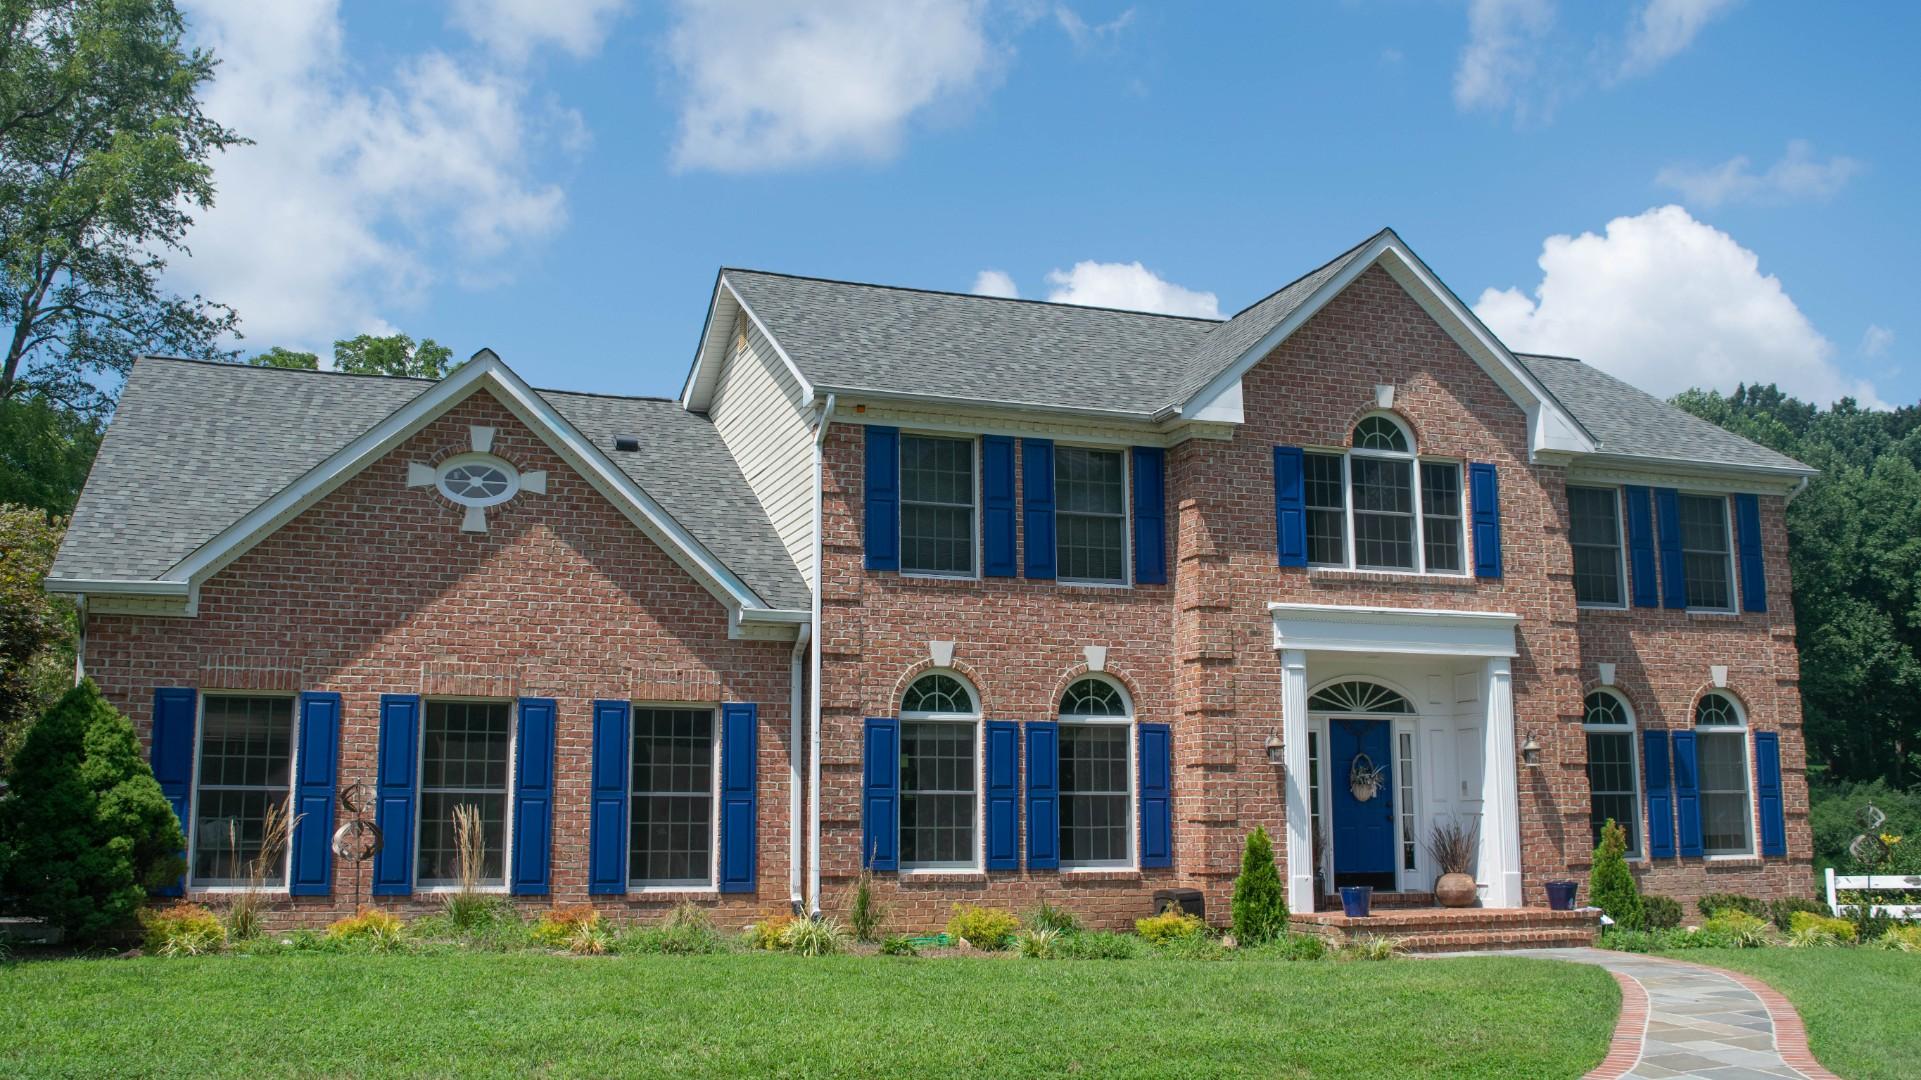 SmartRoof - Residential, Commercial Burlington Township NJ Roofing Contractors